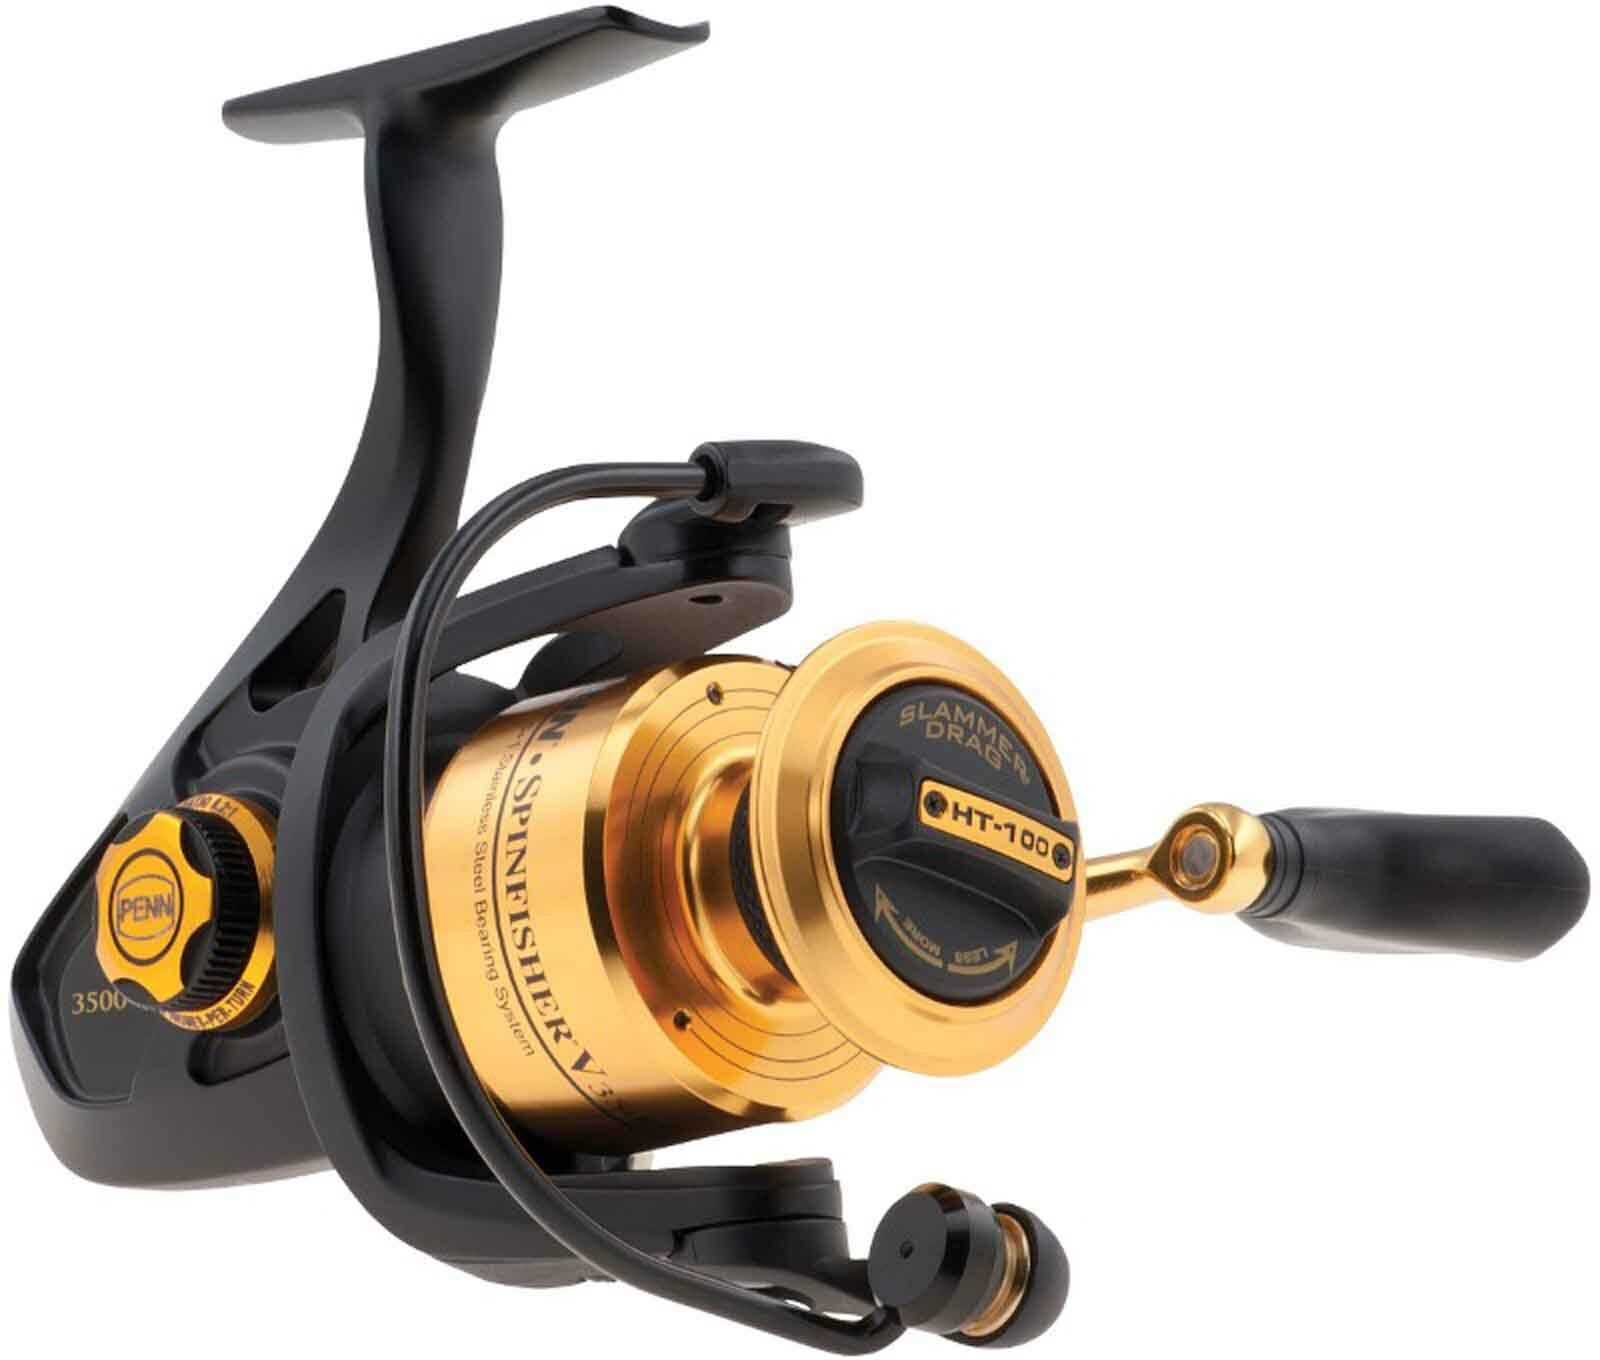 Penn SSV Spinfisher Long Cast Sea Spinning Fixed Spool Fishing Reel Reel Fishing - All Models 3b8aff